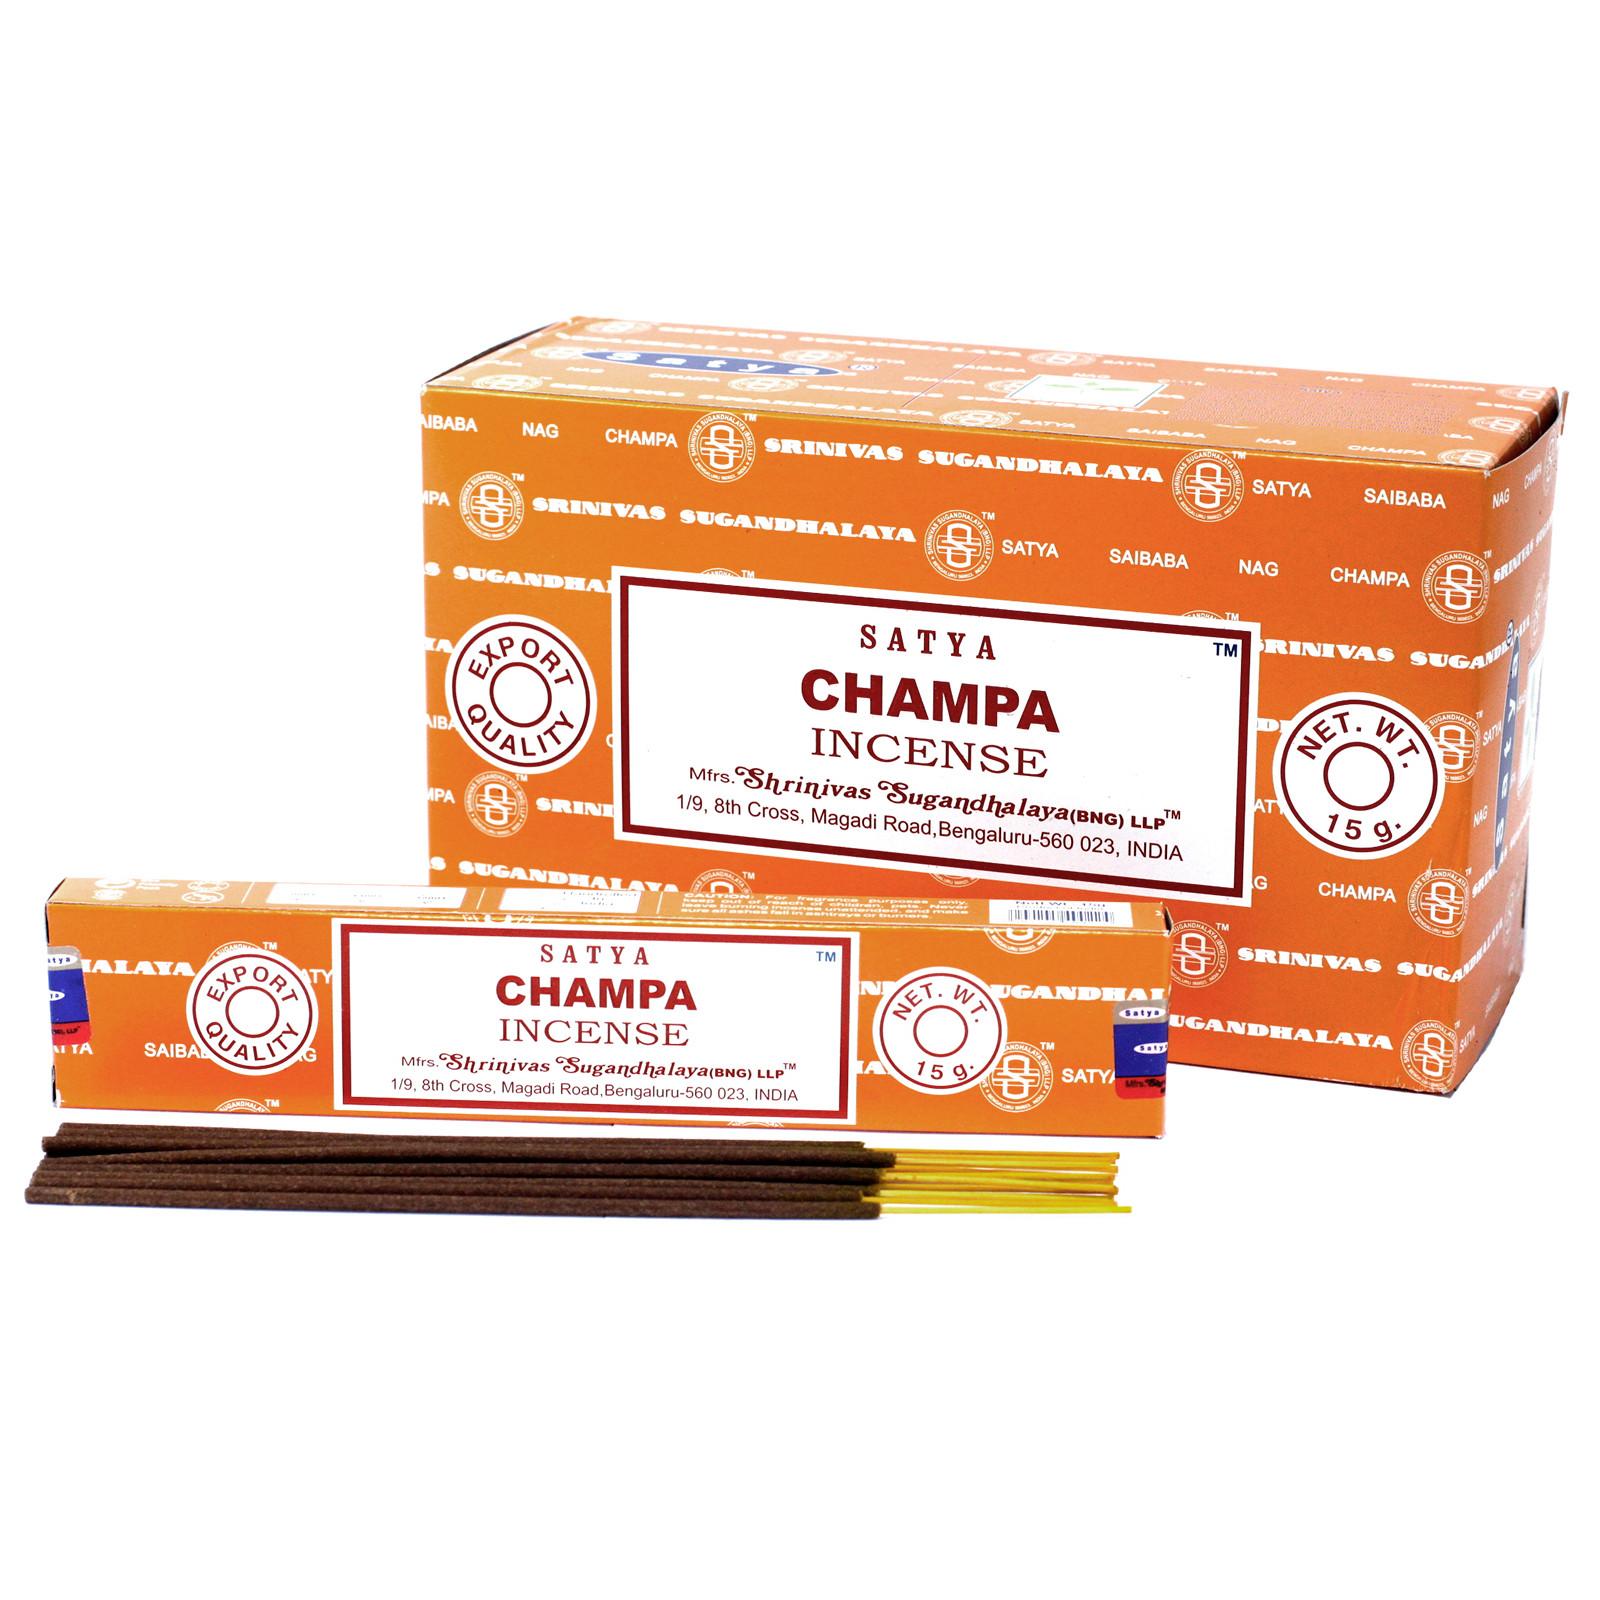 Satya Incense 15gm Champa